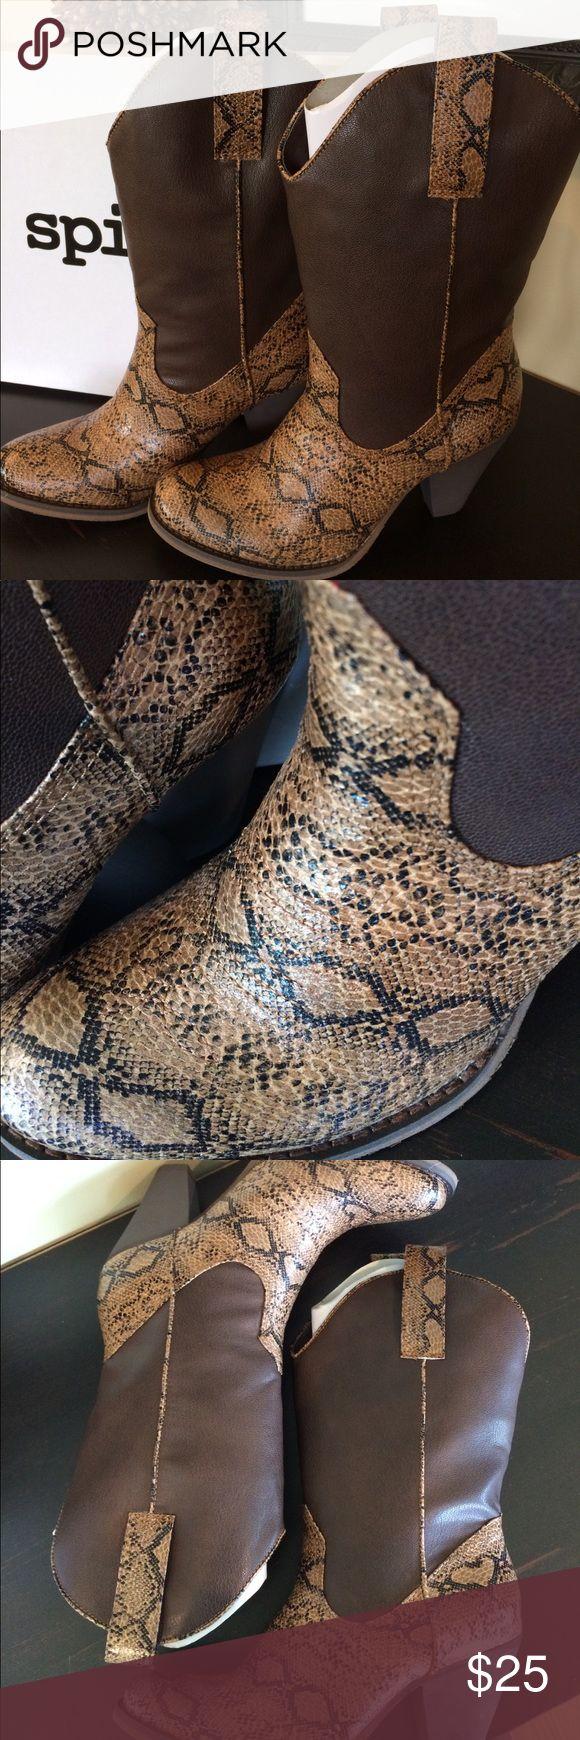 "Women's Size 7.5 Faux Snakeskin Cowboy Boots Women's Size 7.5 Faux Snakeskin Cowboy Boots NEW WITHOUT BOX Spite ""Rattler"" Spite Shoes Heeled Boots"